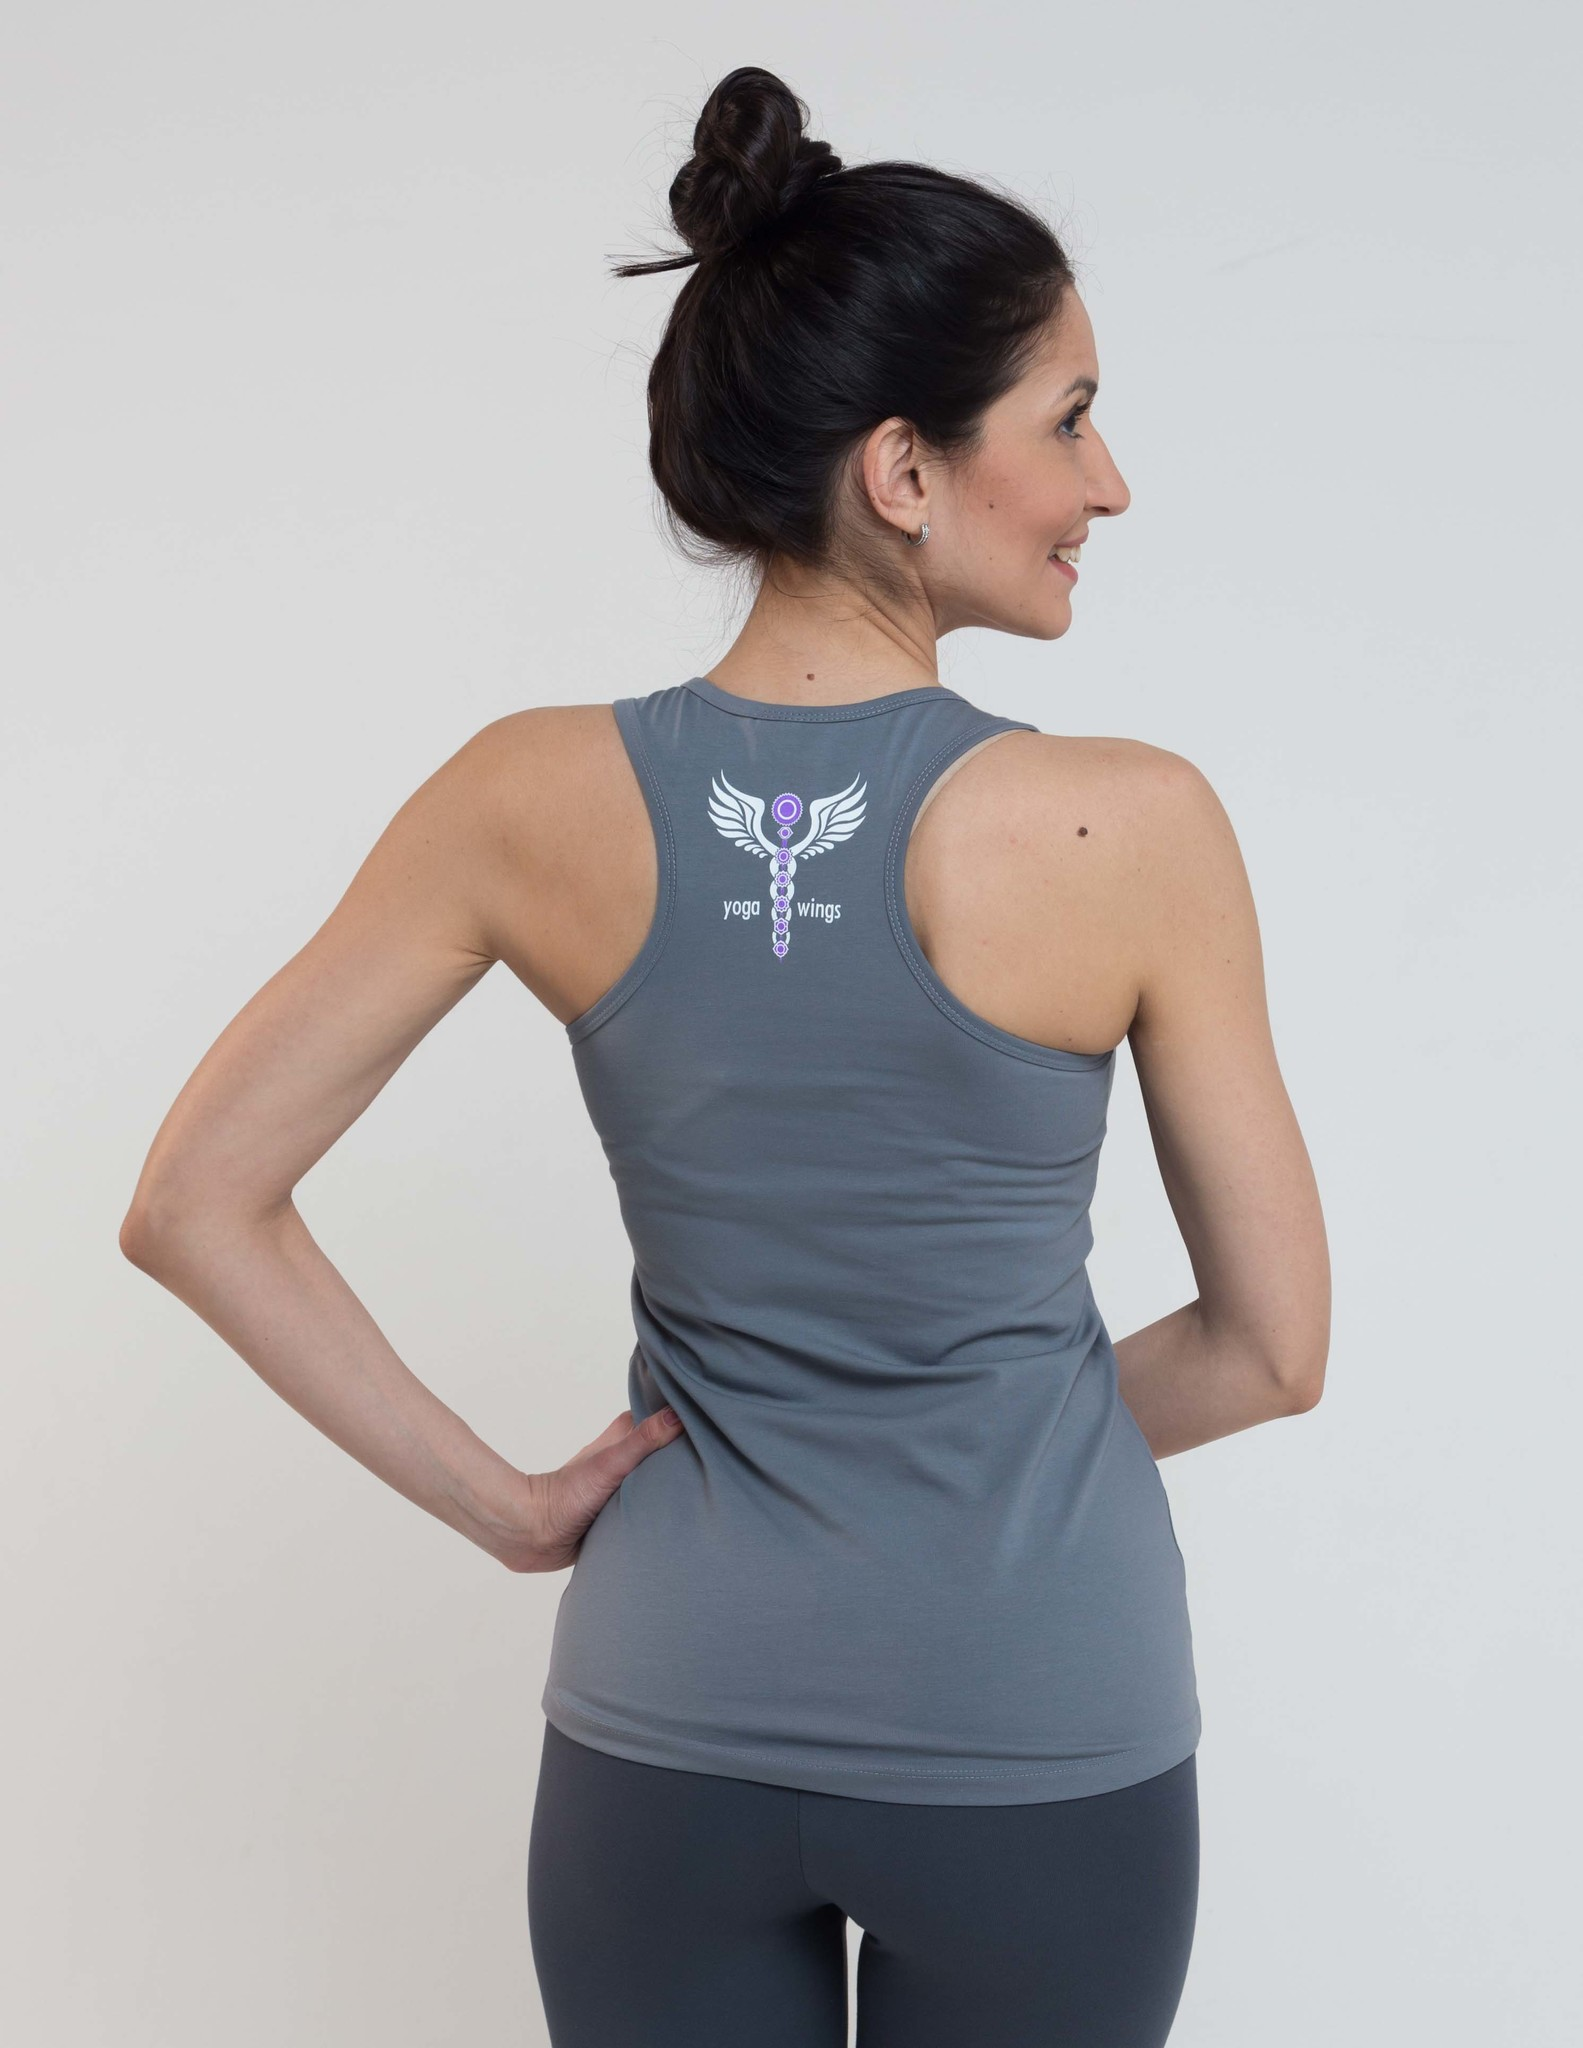 Топ женский Yoga Wings YogaDress (0.2 кг, M (46), бордо) женский комбинезон s m l